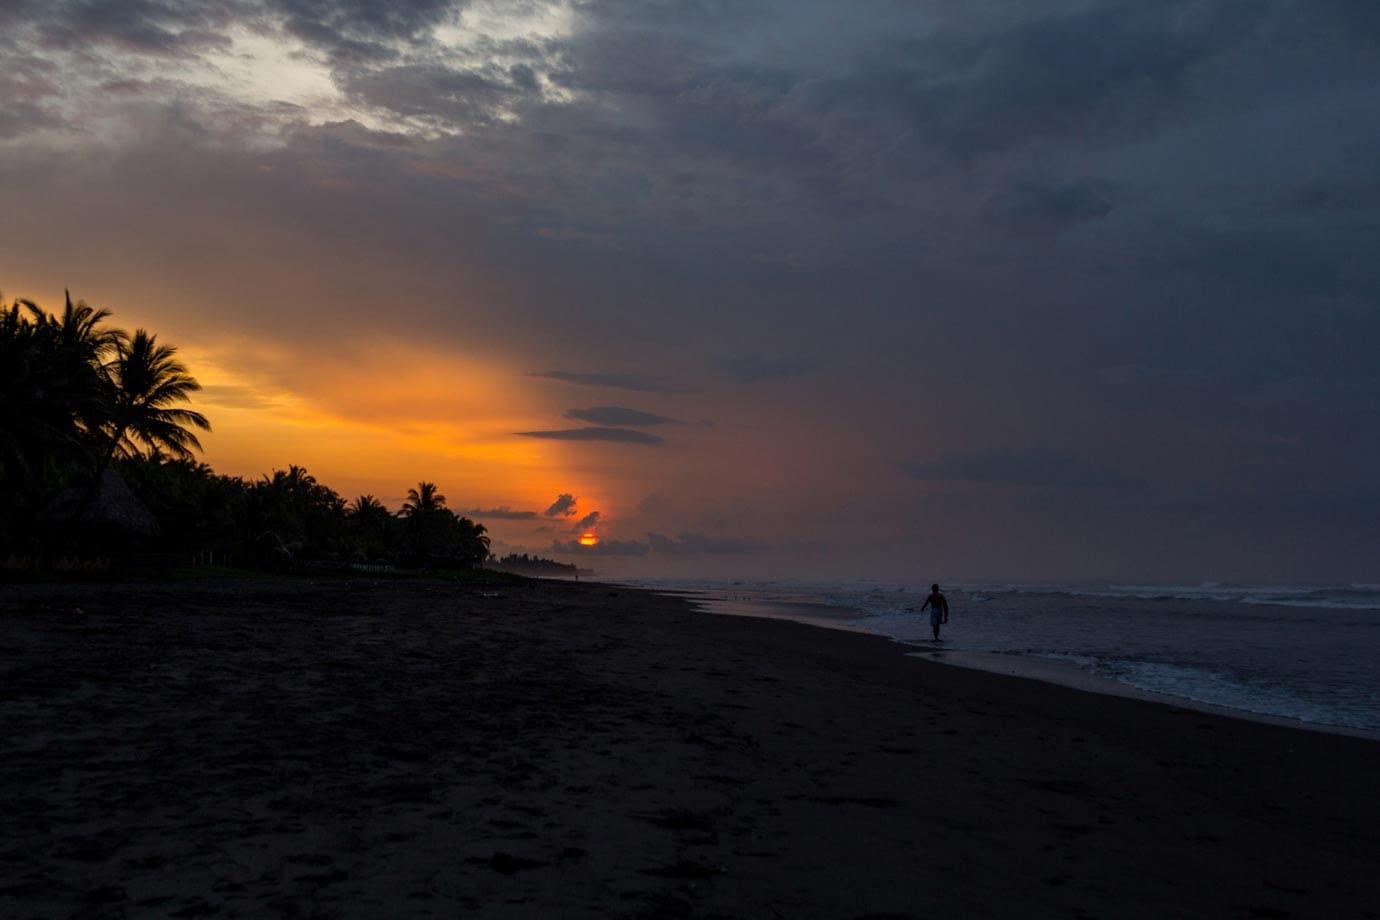 Surfing in El Salvador at sunrise